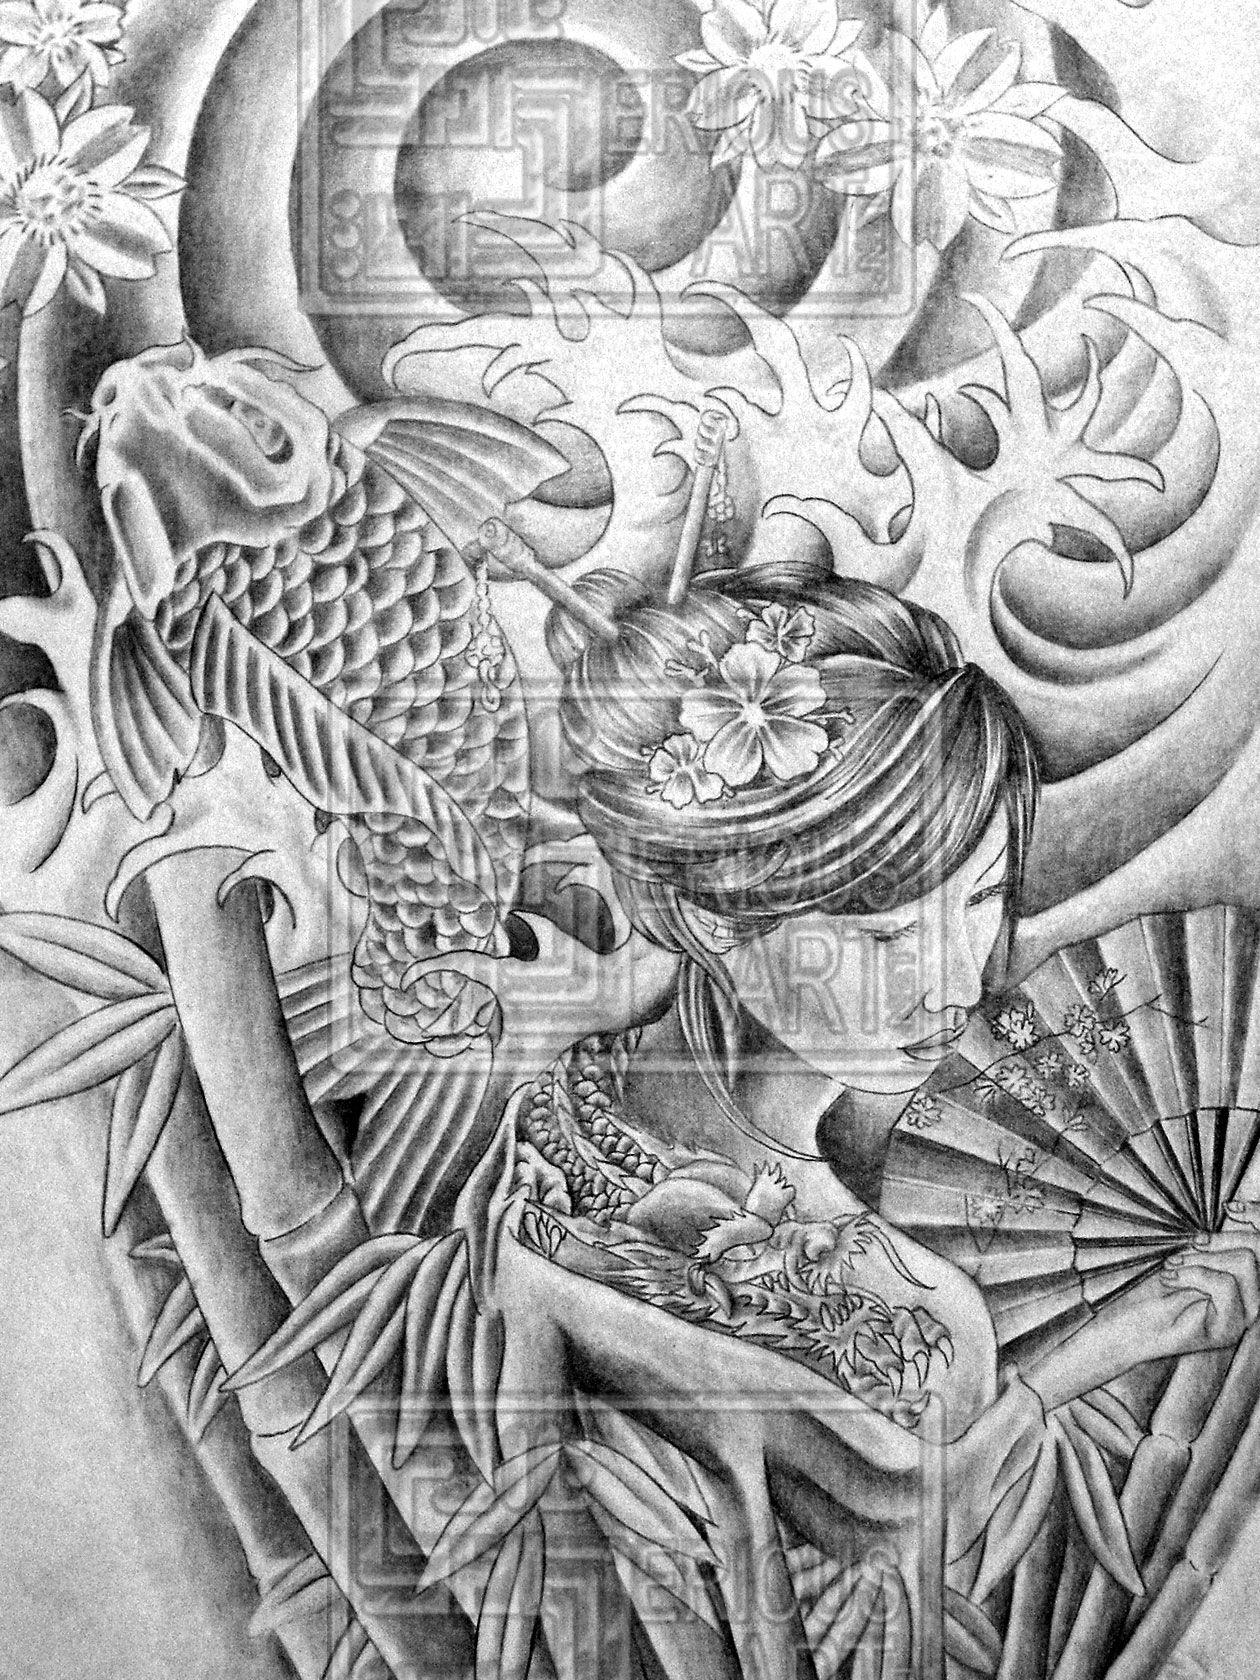 Japanese half sleeve tattoo designs - Japanese Tattoo Drawings Japanese Sleeve Tattoos Are A Great Form Of Art I Created This